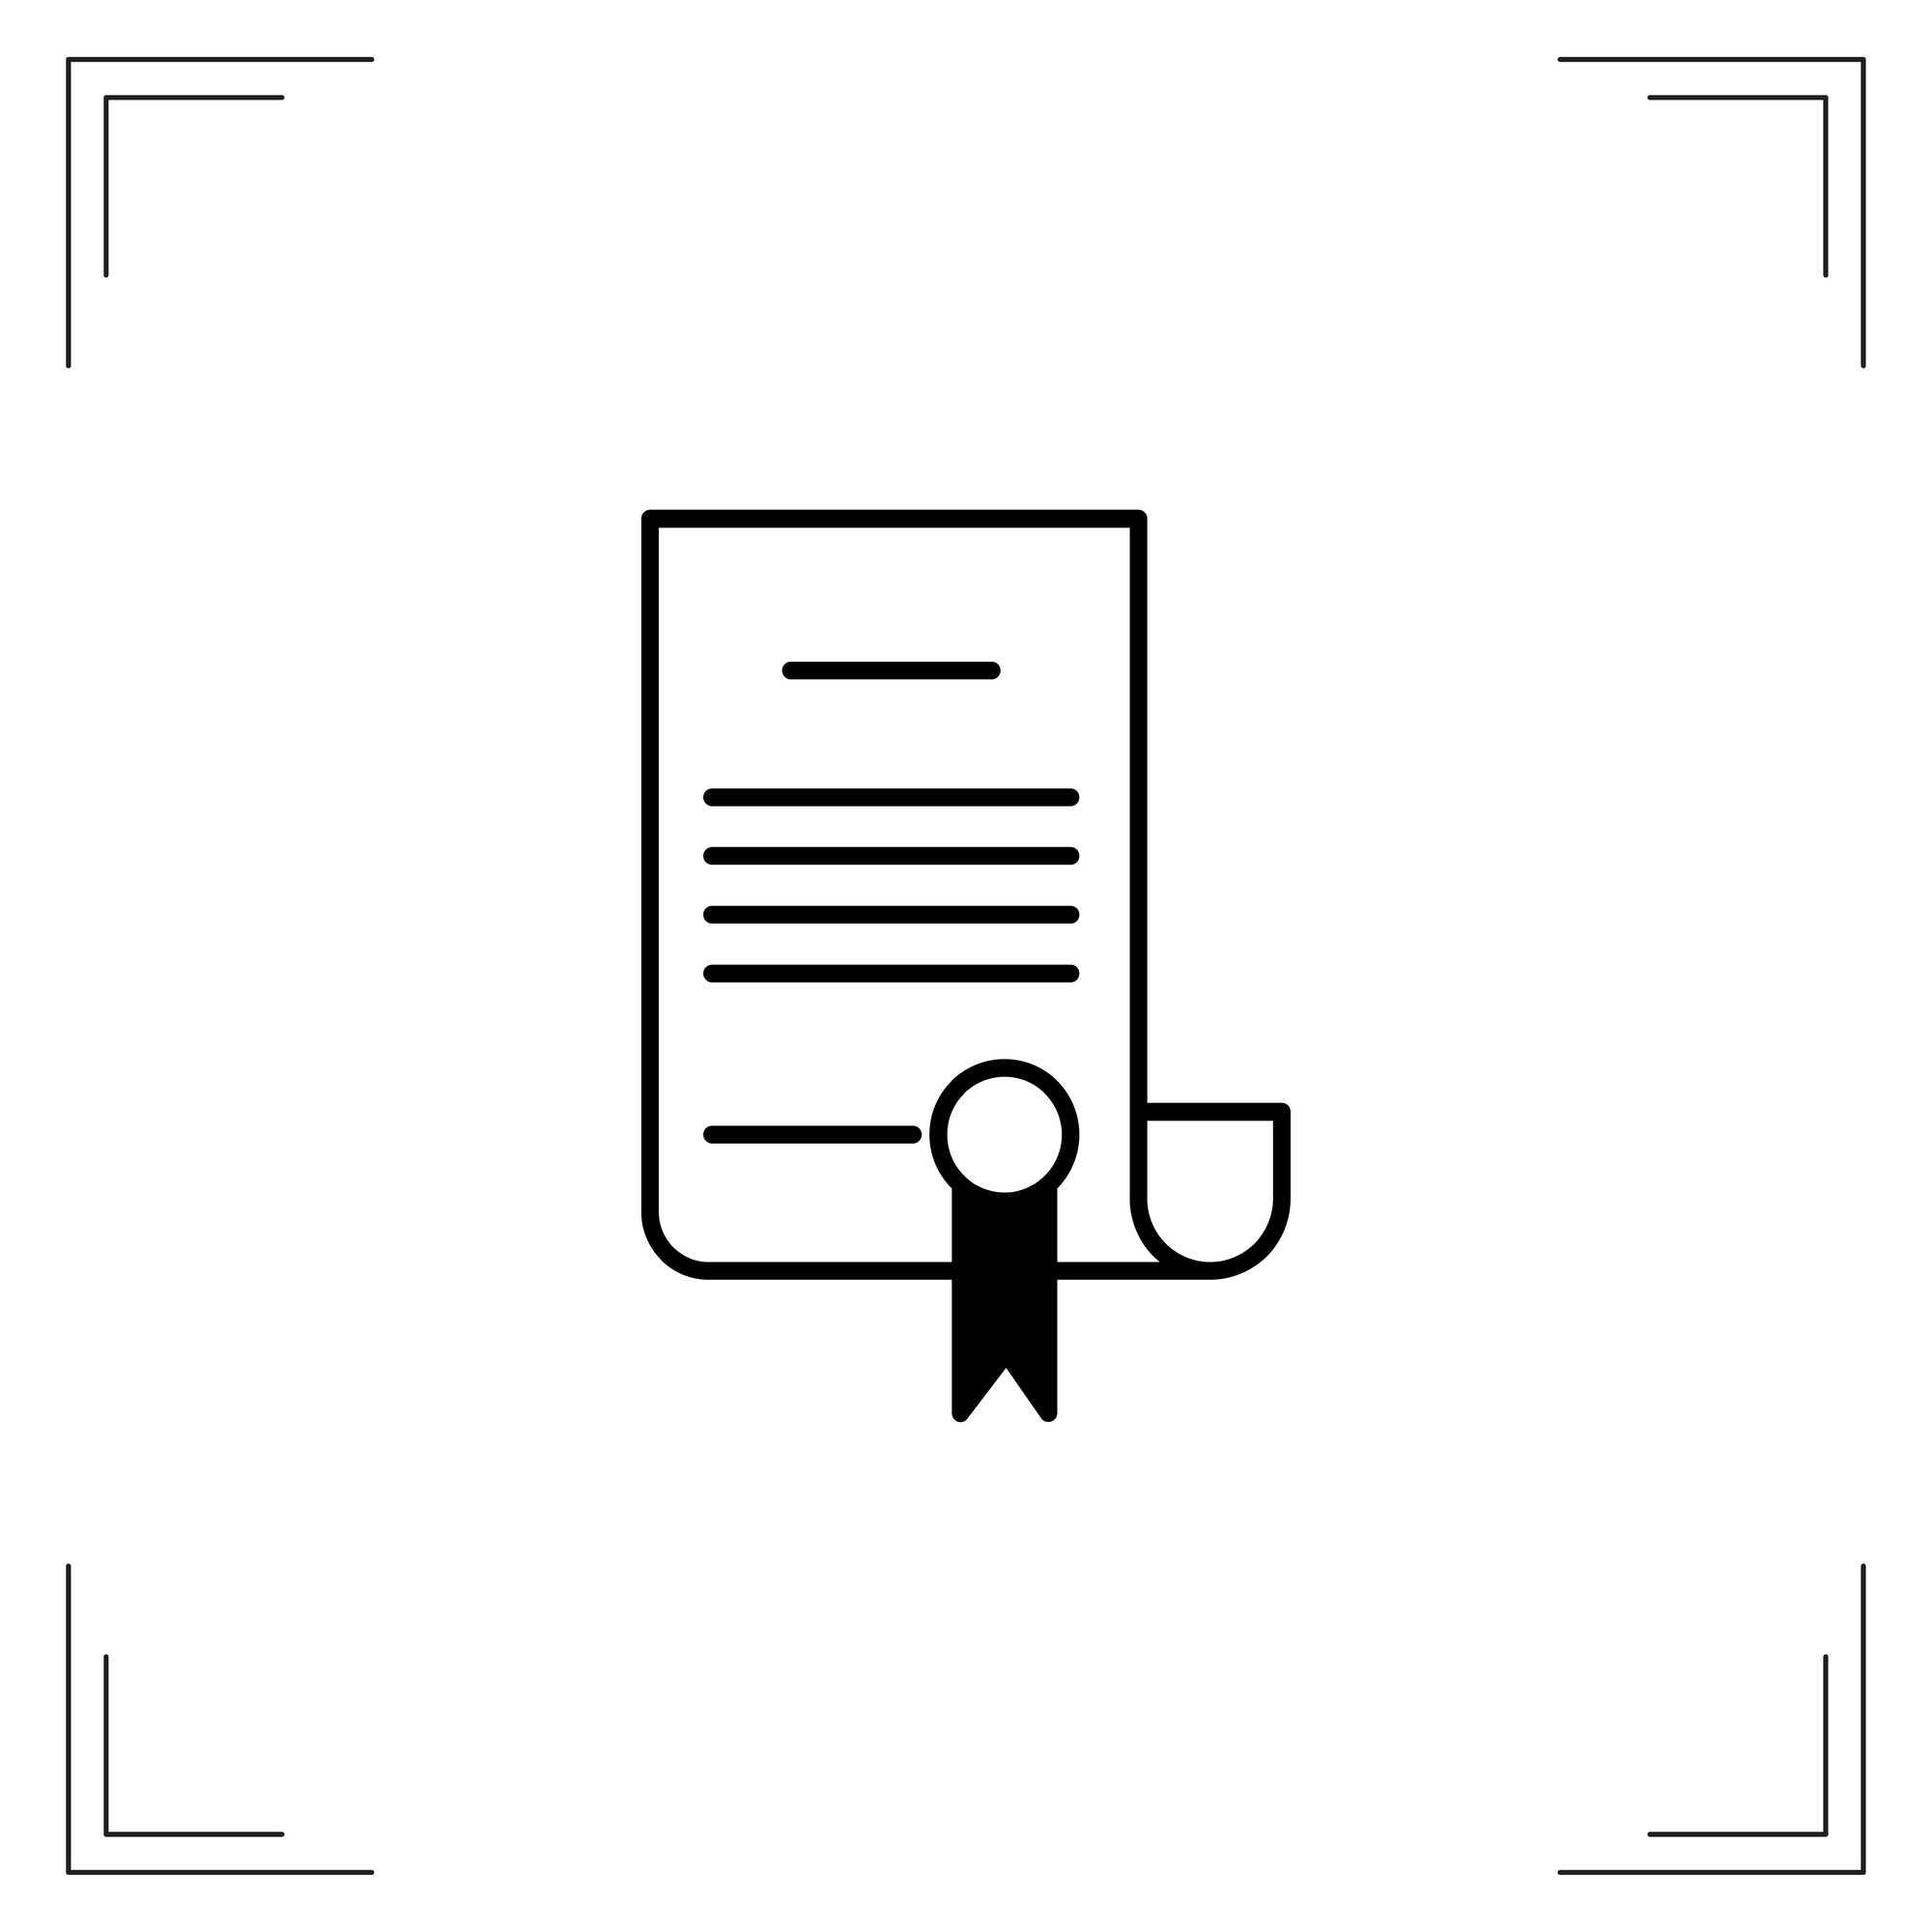 5 certified microsoft word templates use mocd skillsfuture courses